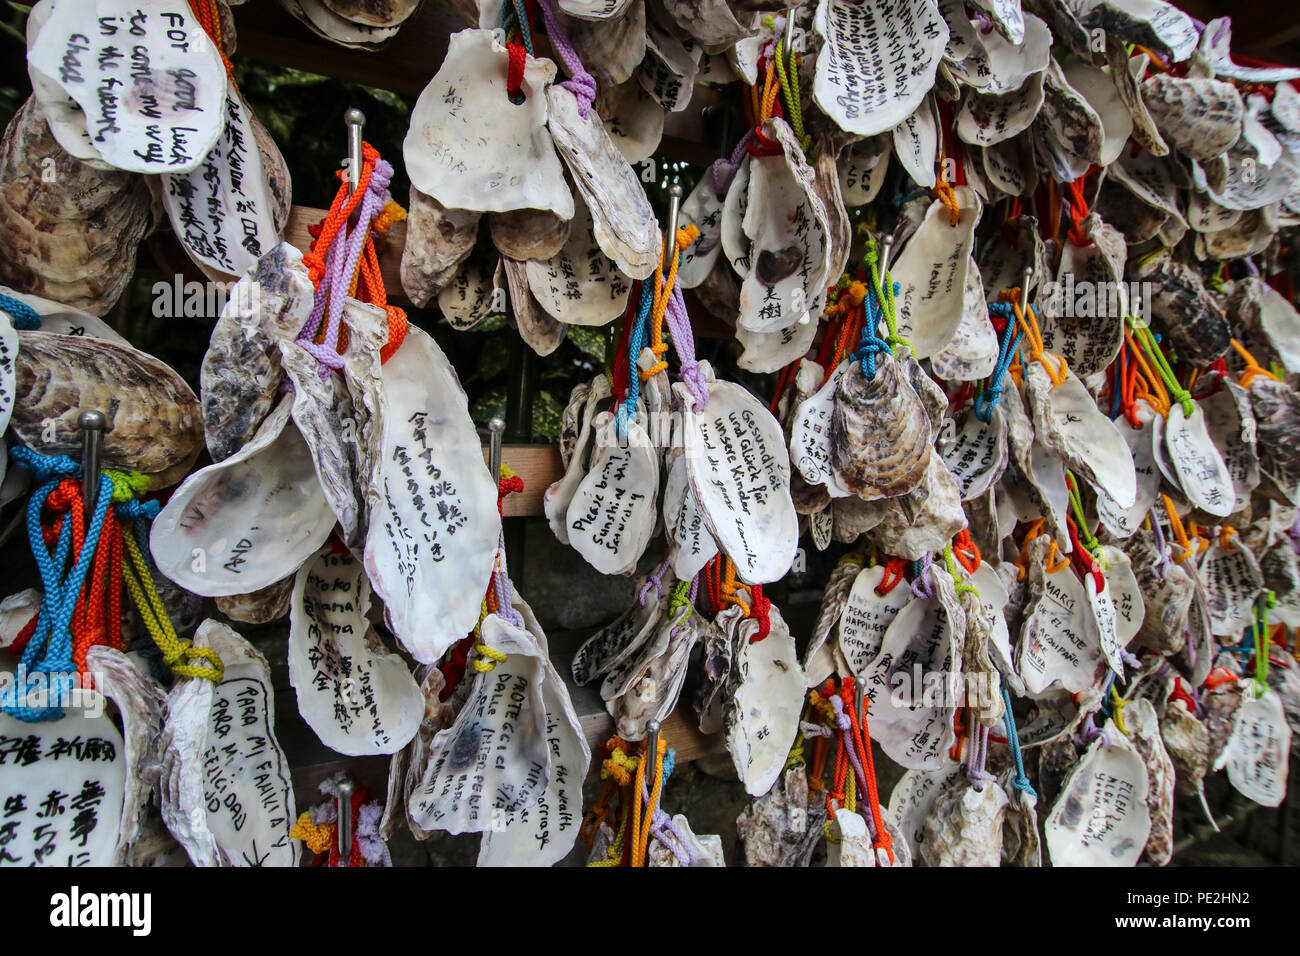 Writen wishes on oyster shells (Ema) at Kakigara Inari (かきがら稲荷) a Shinto Shrine at the Hase-dera temple in Kamakura, Kanagawa Prefecture, Japan. - Stock Image